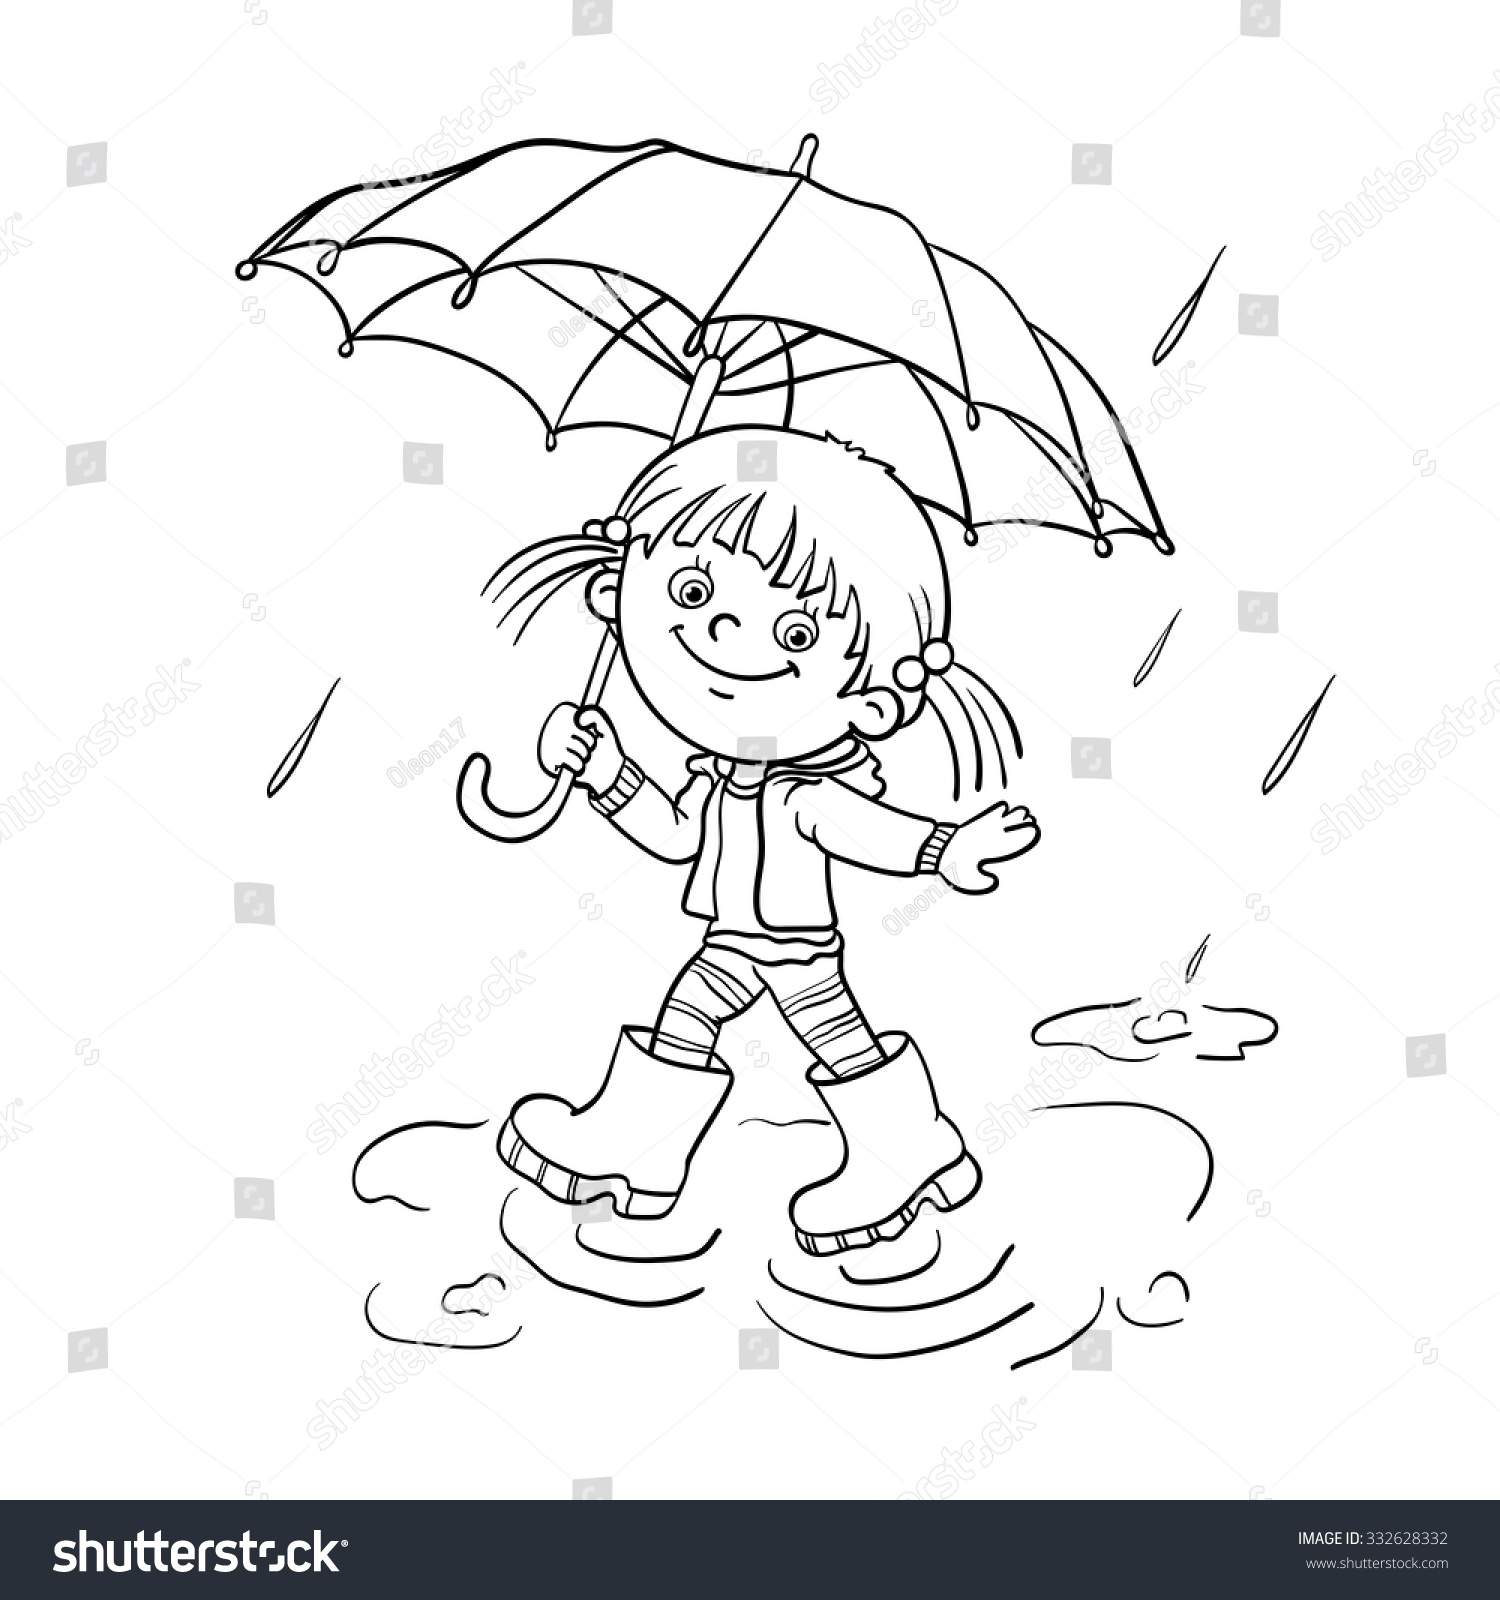 coloring page outline cartoon joyful stock vector 332628332